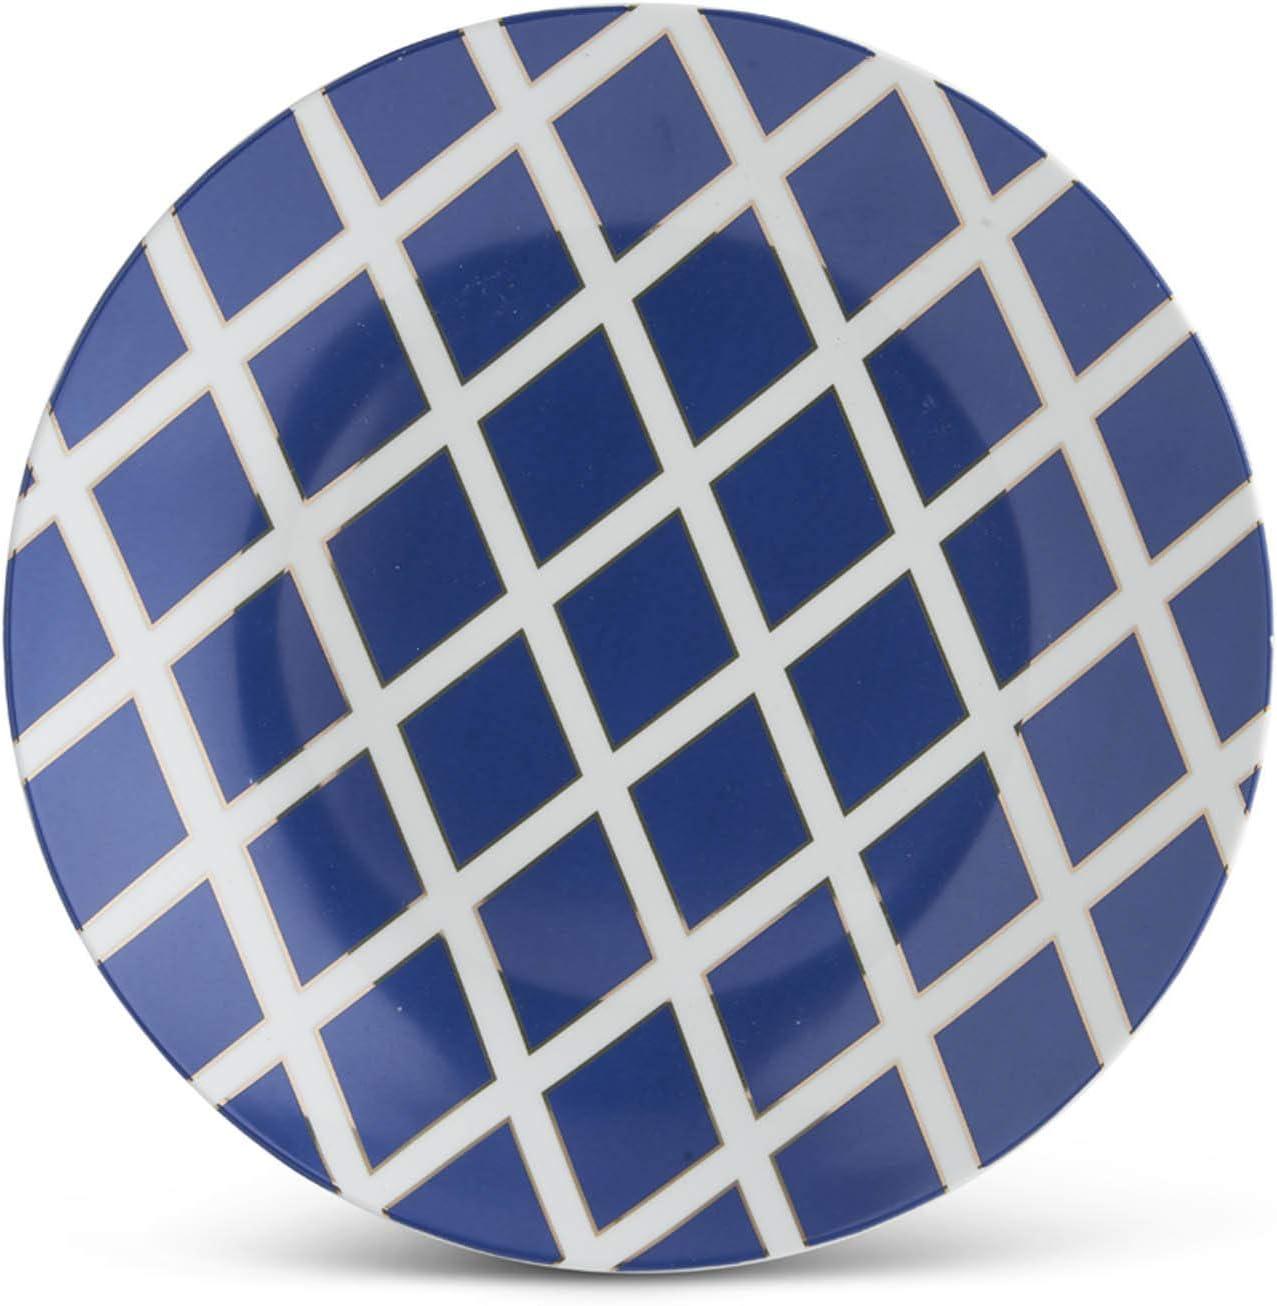 KK Interiors 16346B Cheap mail order shopping Over item handling ☆ 13 Inch Royal Crisscross White Pla and Blue